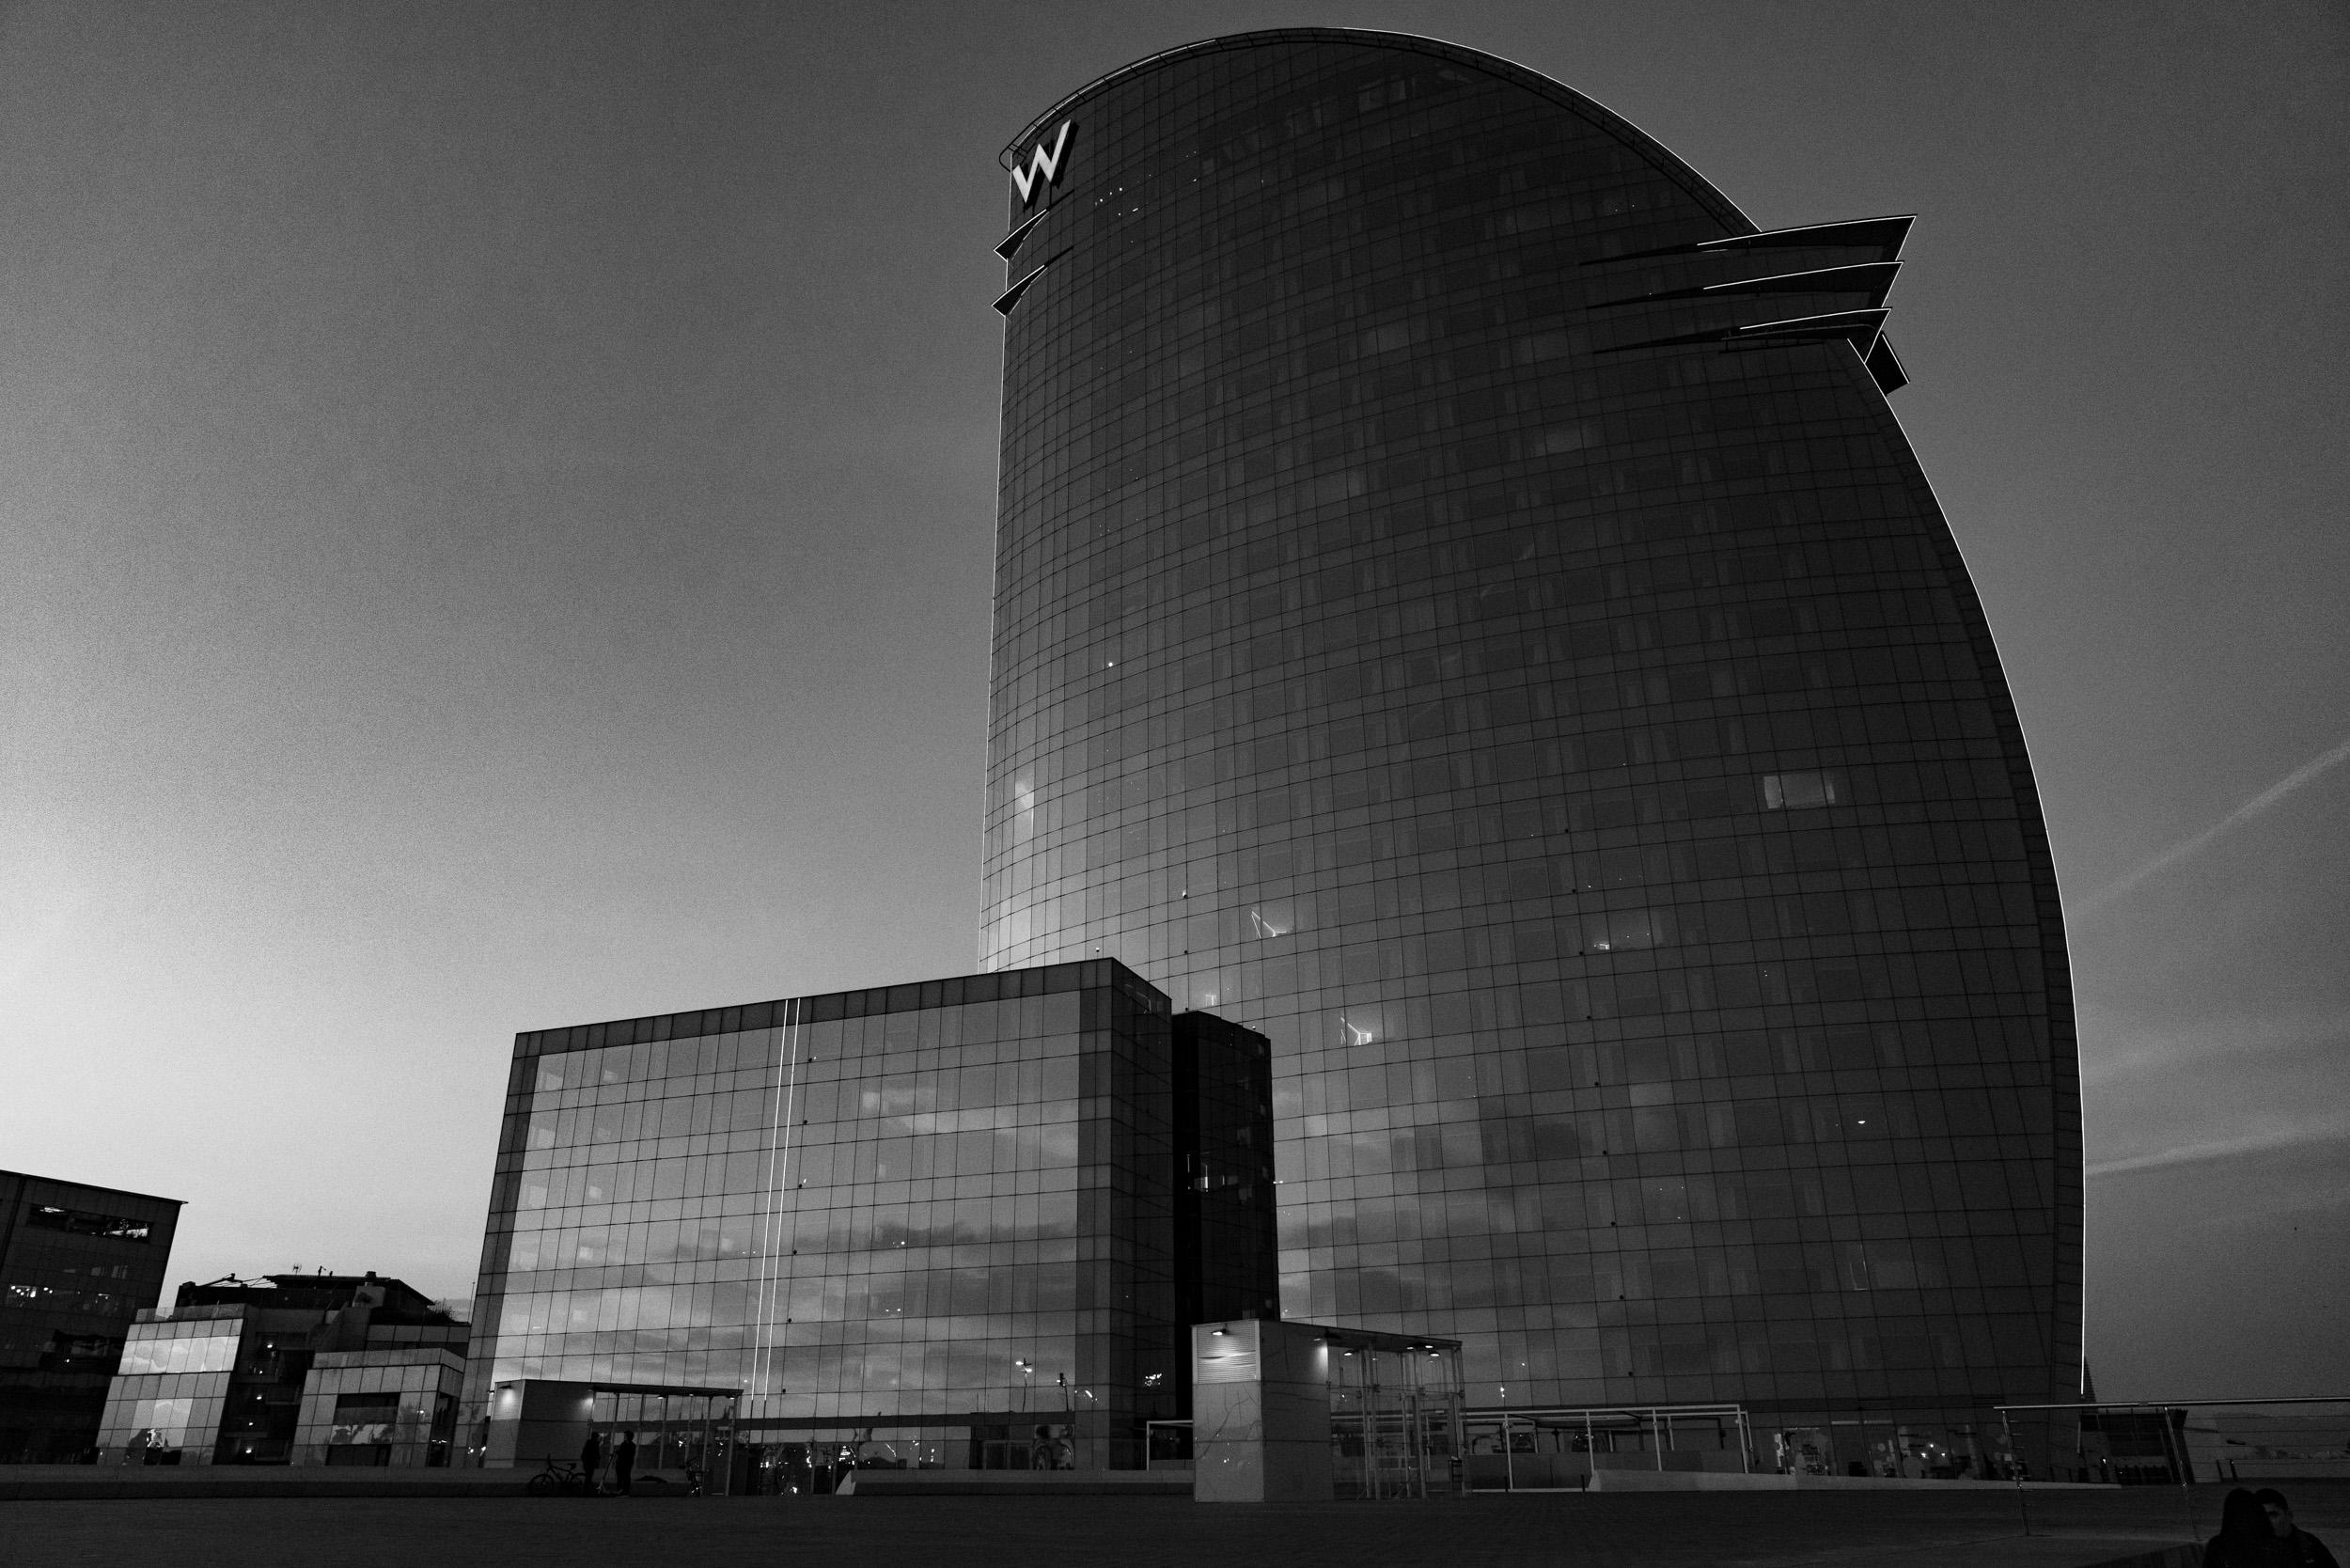 Barcelona_03_2019-143.jpg